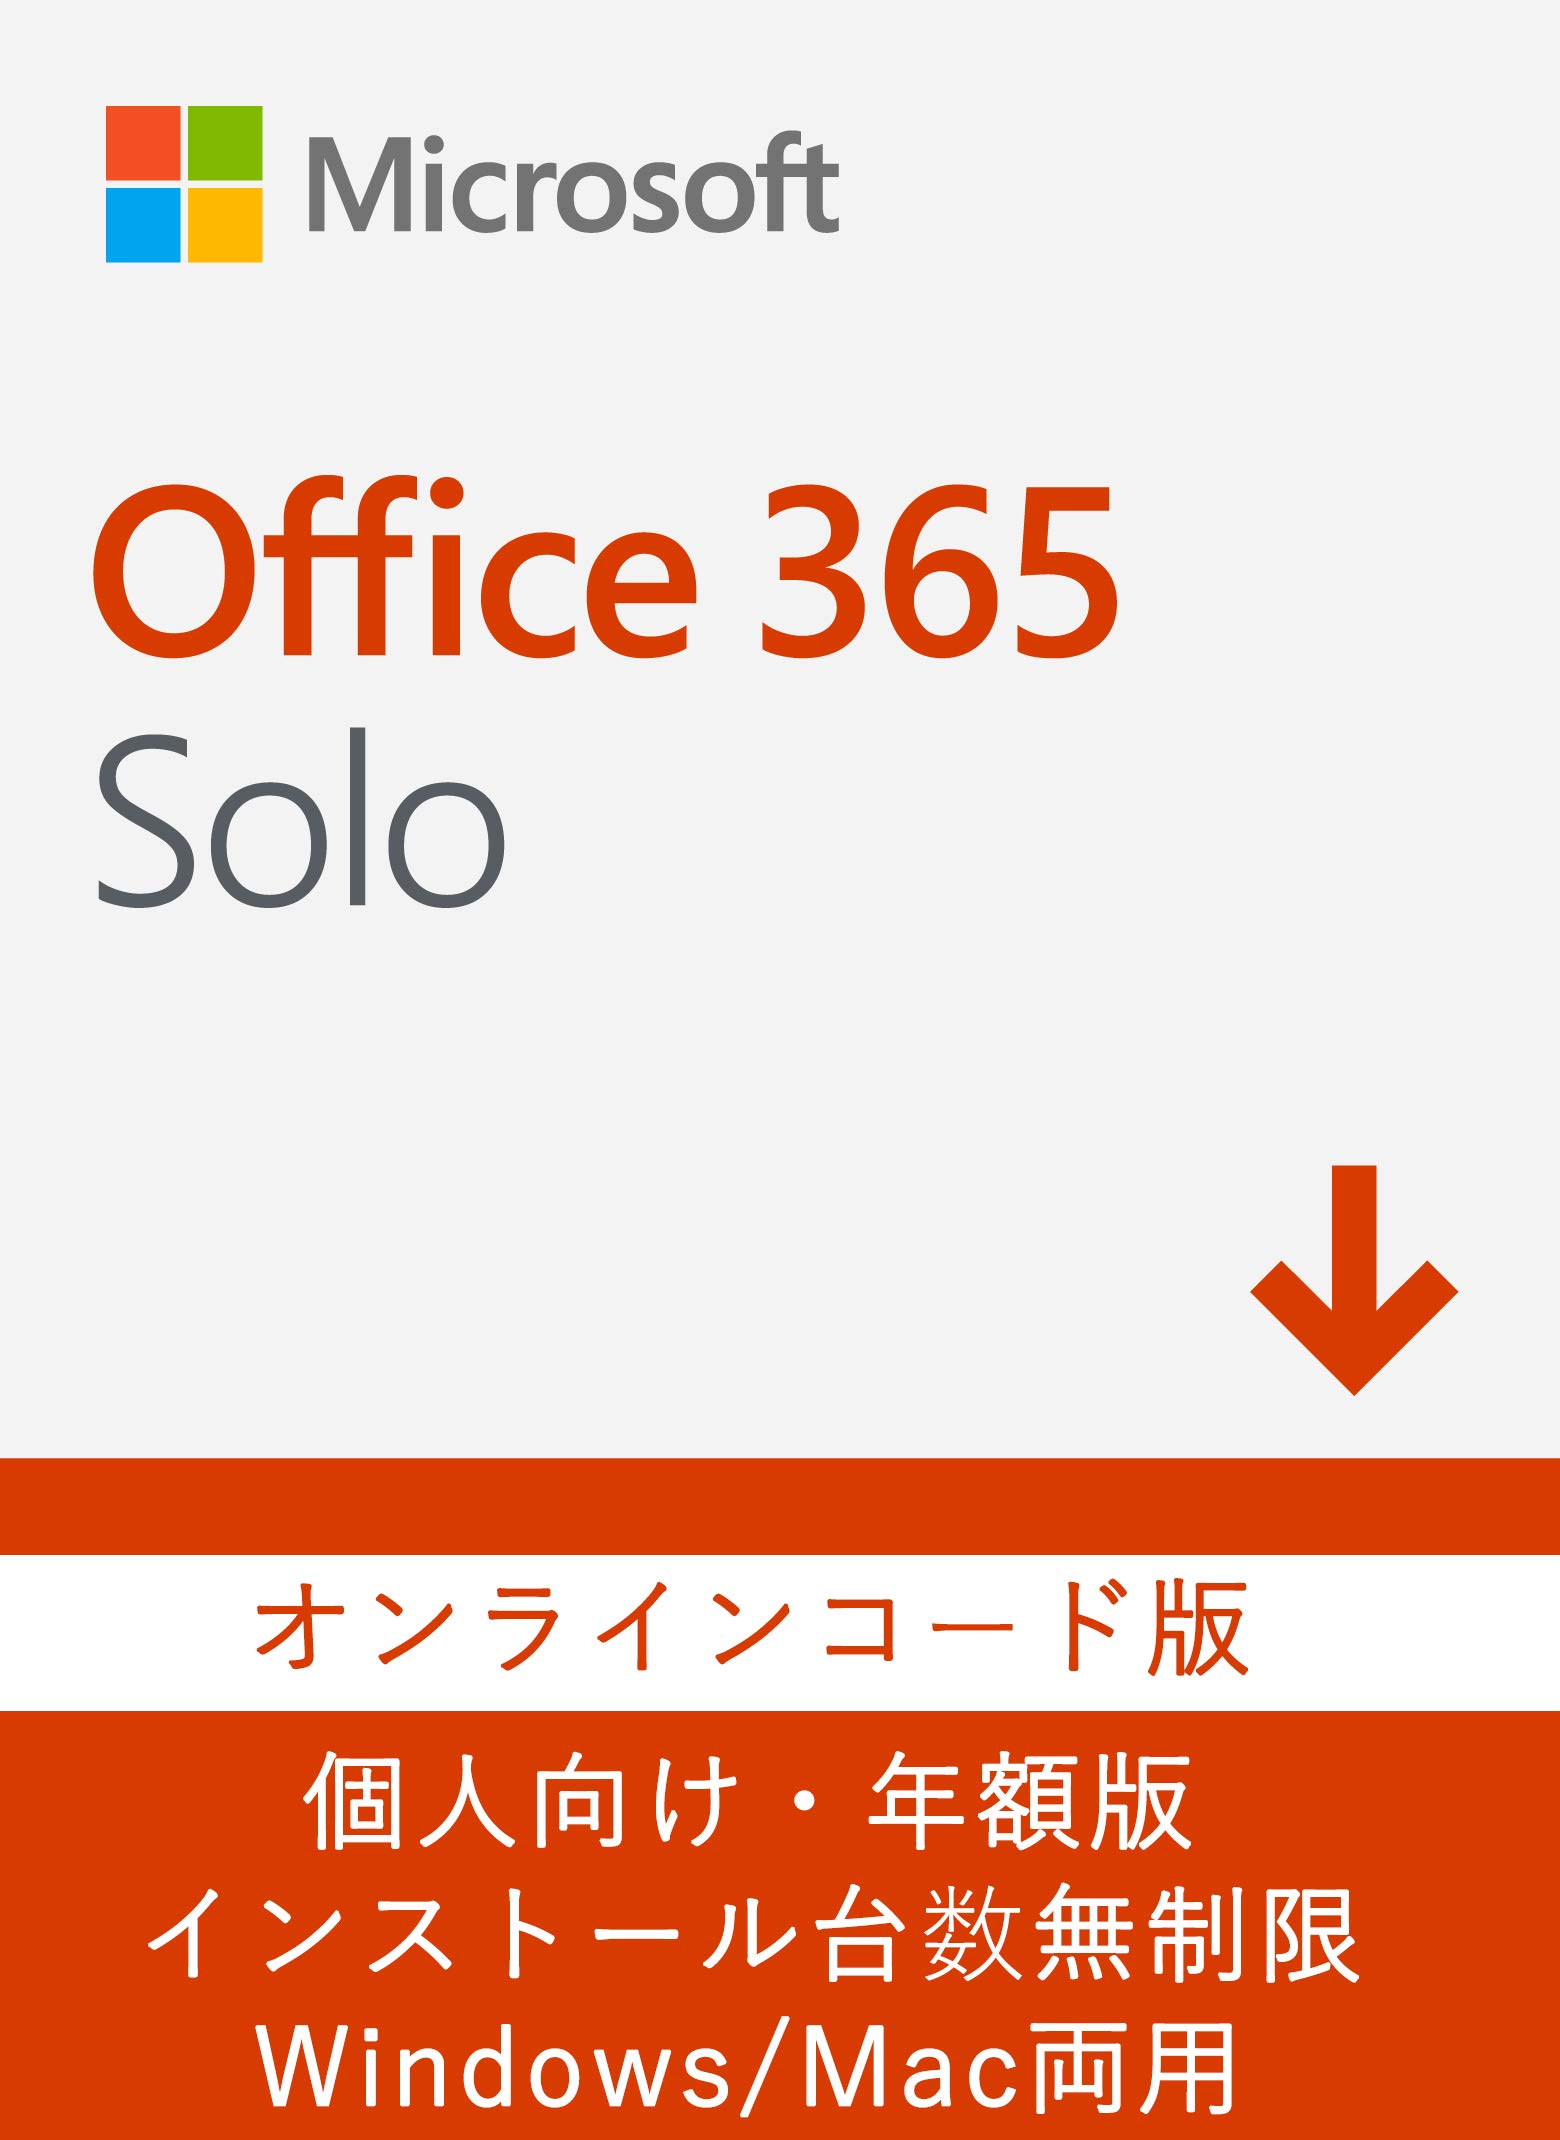 Microsoft Office 365 Solo (最新 1年版)|オンラインコード版|Win/Mac/iPad|インストール台数無制限|メーカー主催3000円キャッシュバック実施中(12/25まで